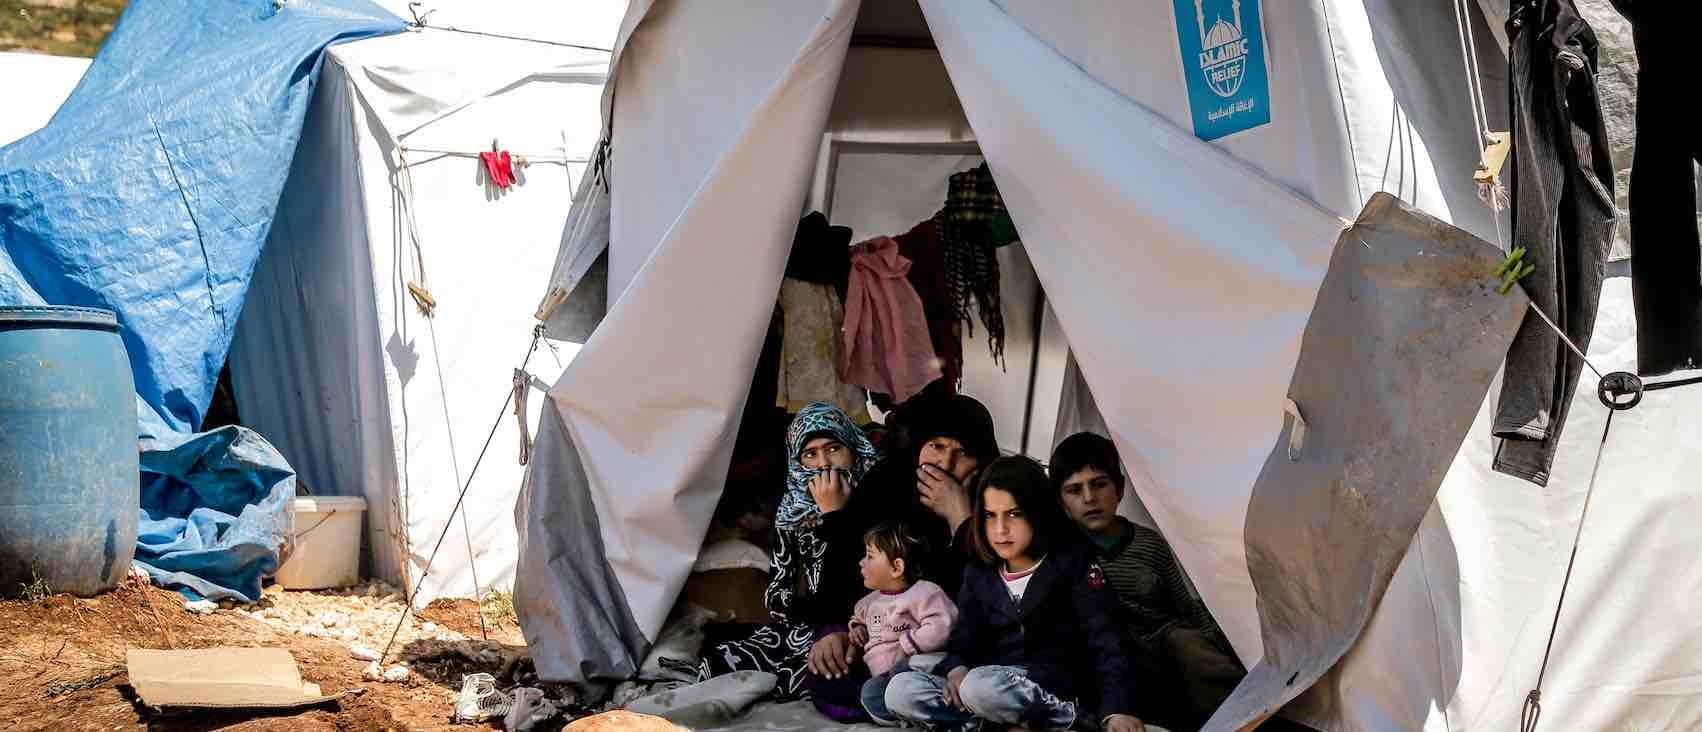 Covid refugee camp